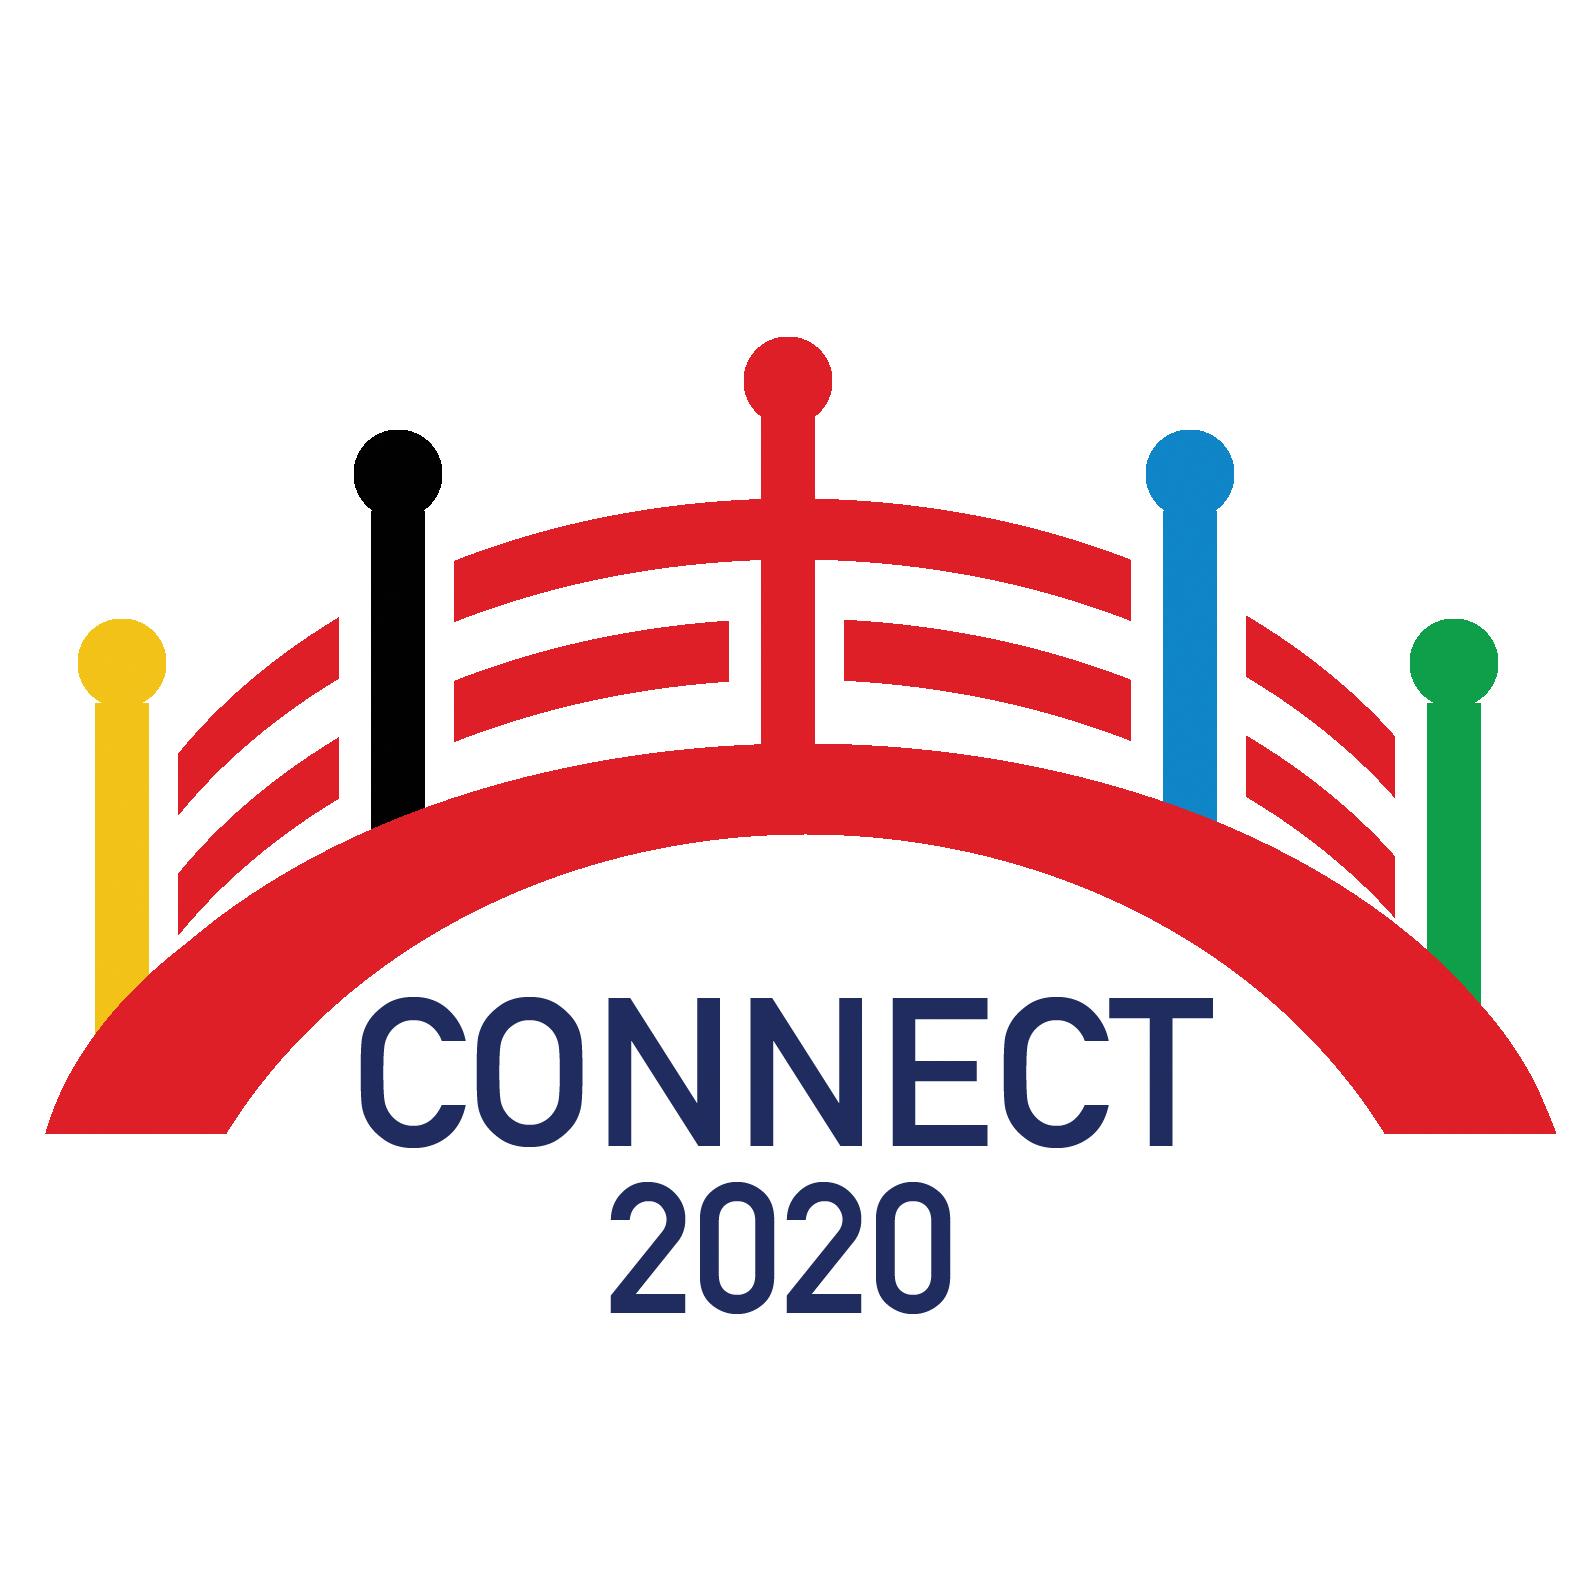 Connect 2020 Logo.jpg